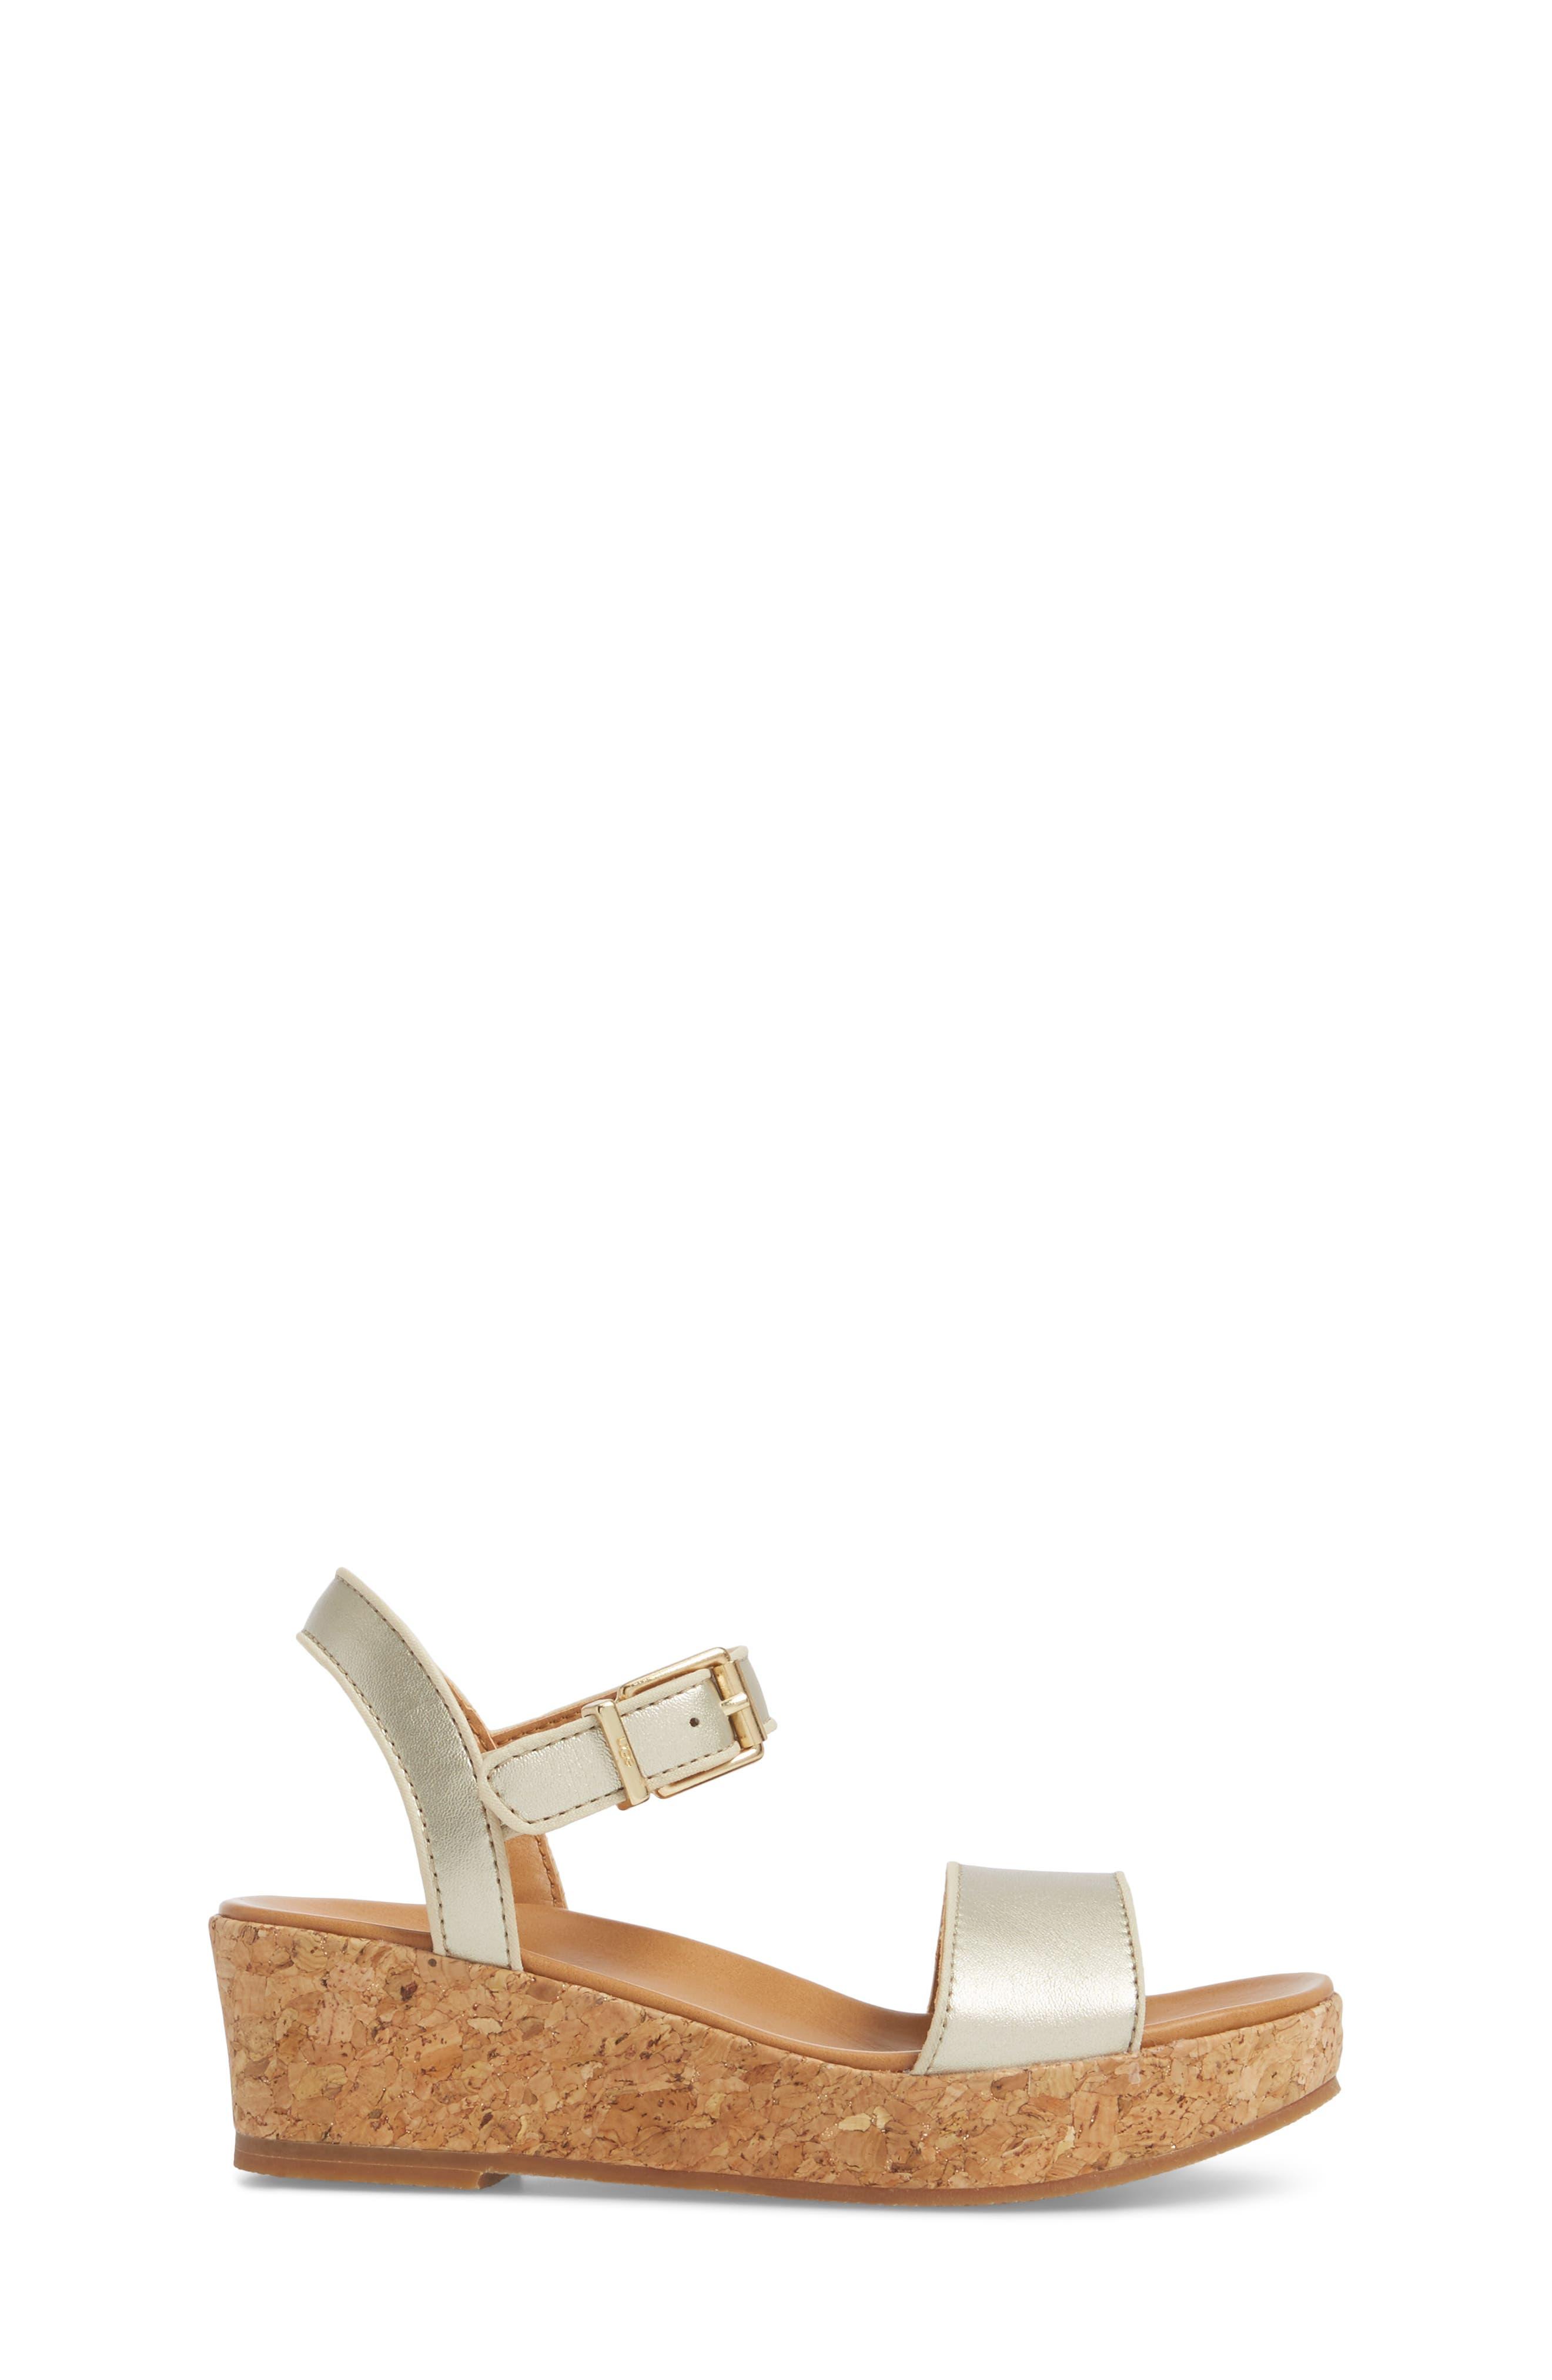 Milley Wedge Sandal,                             Alternate thumbnail 3, color,                             Gold